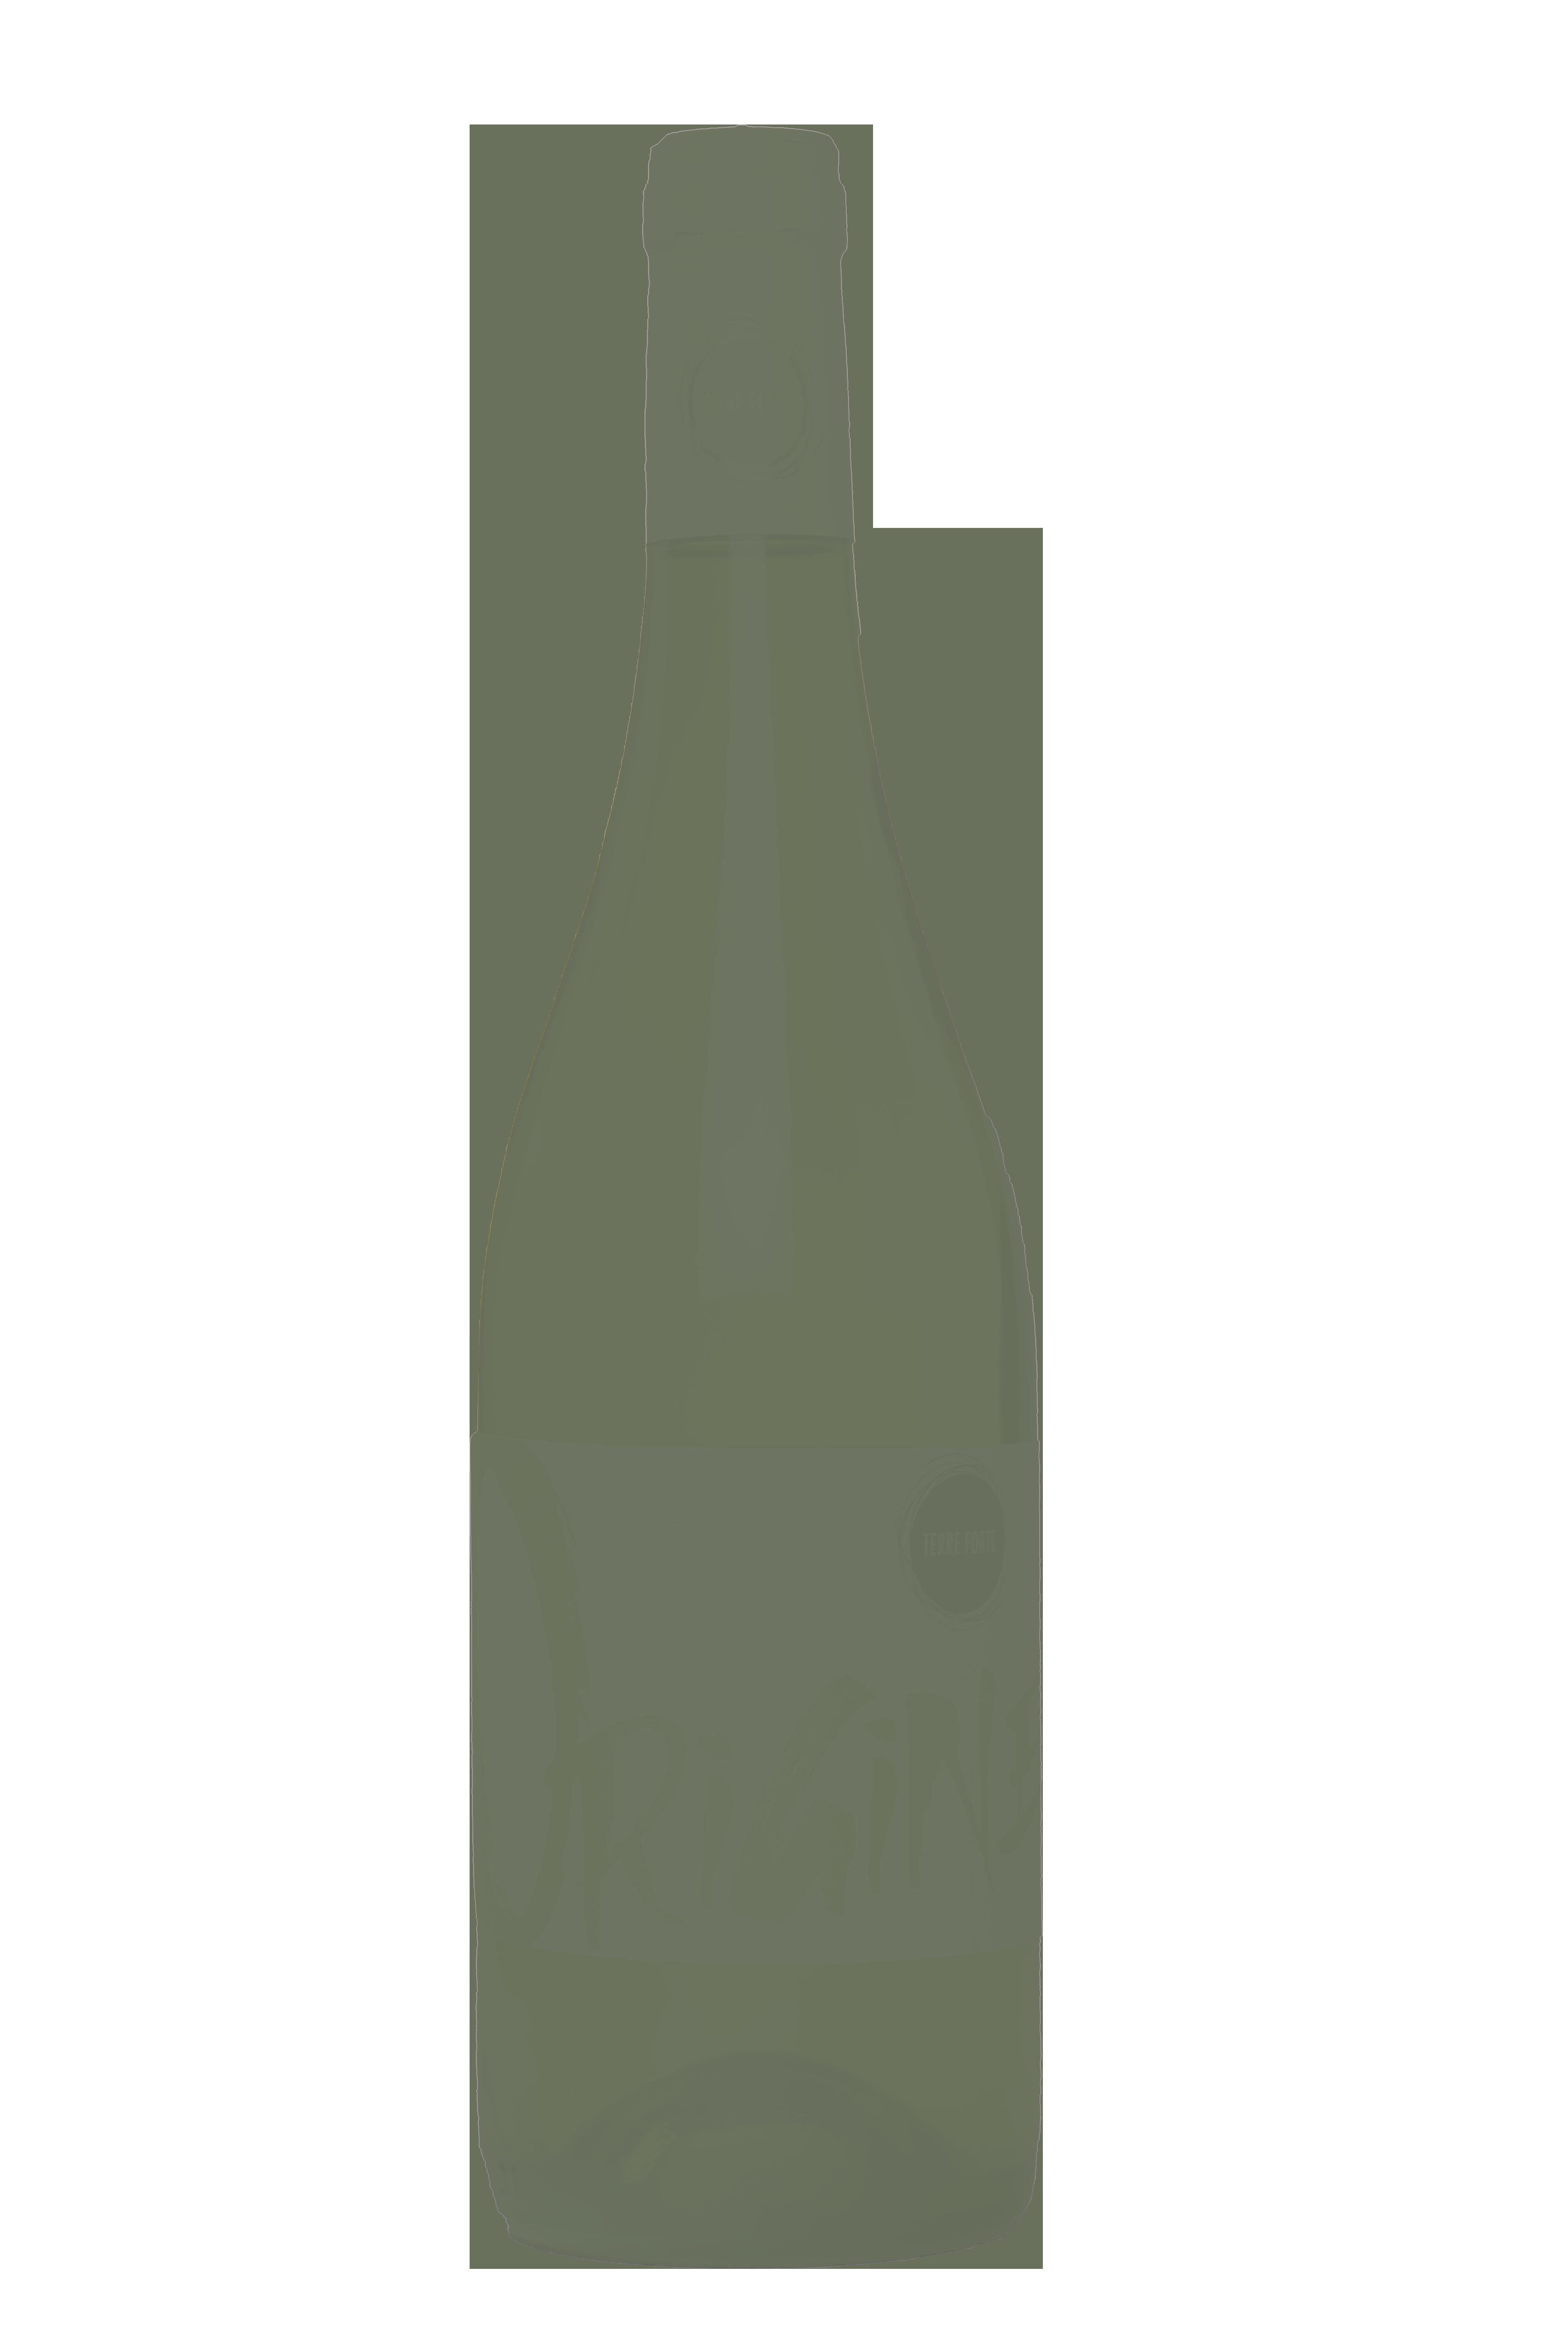 icone feuille de vigne